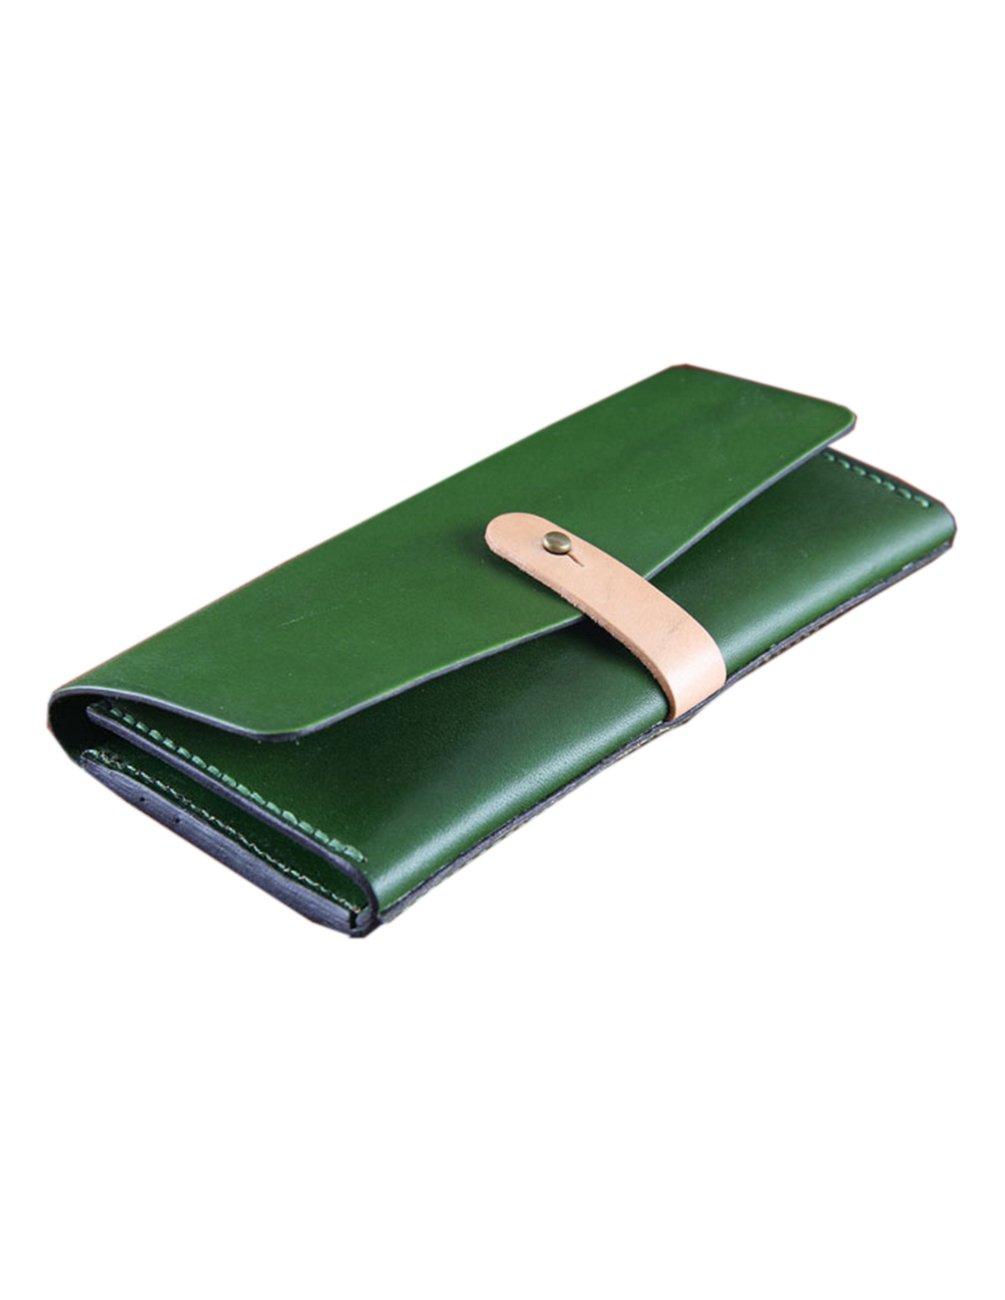 Menschwear Men's Leather Clutch Wallets Card Holder Long PurseGreen